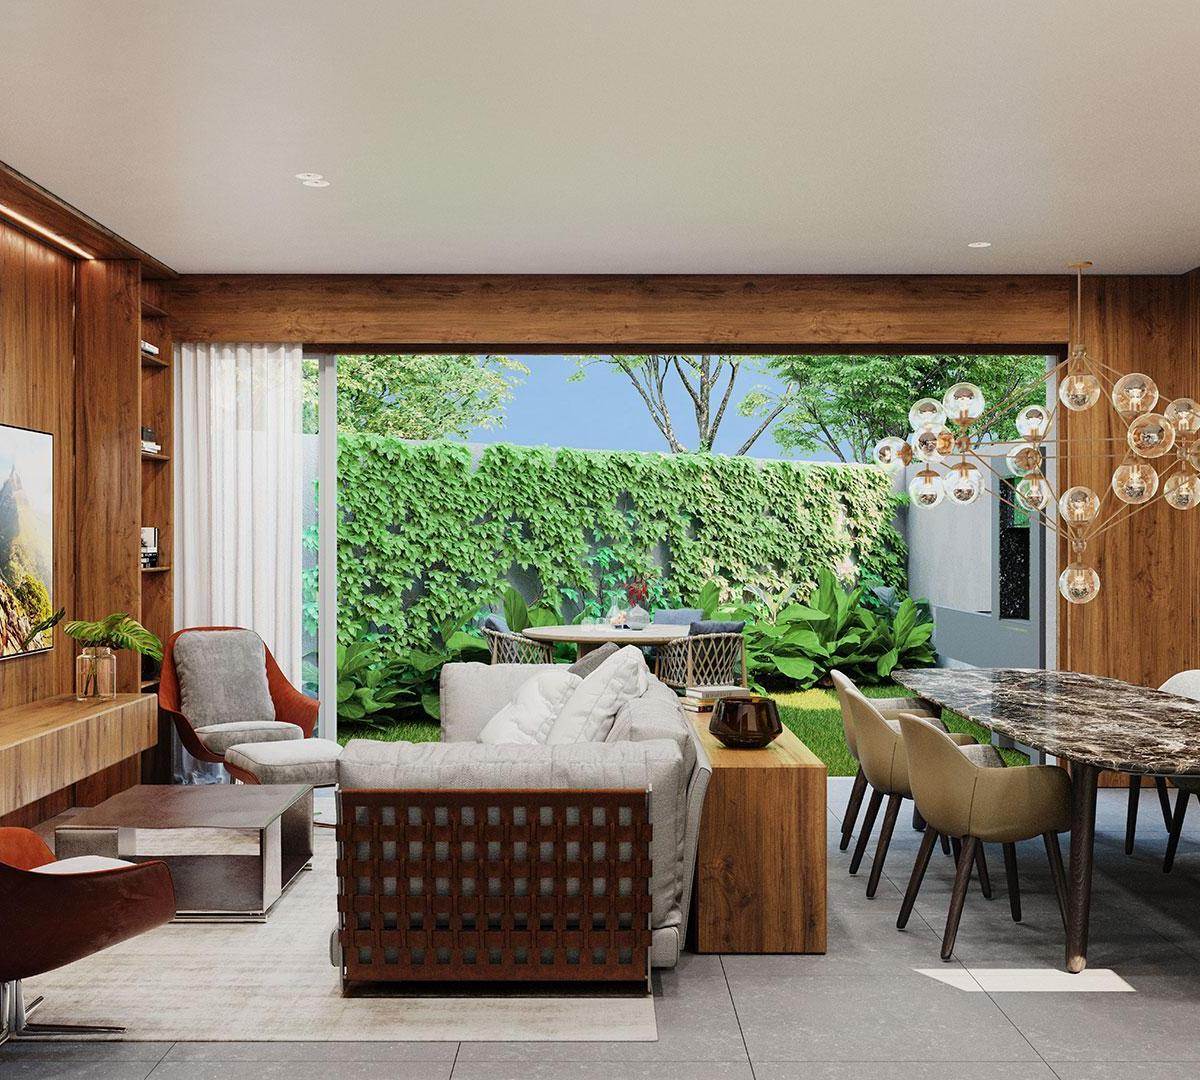 Casa Duplex 145m² Exclusiva 3 Suítes Sobrado Jardim Privativo 85m²